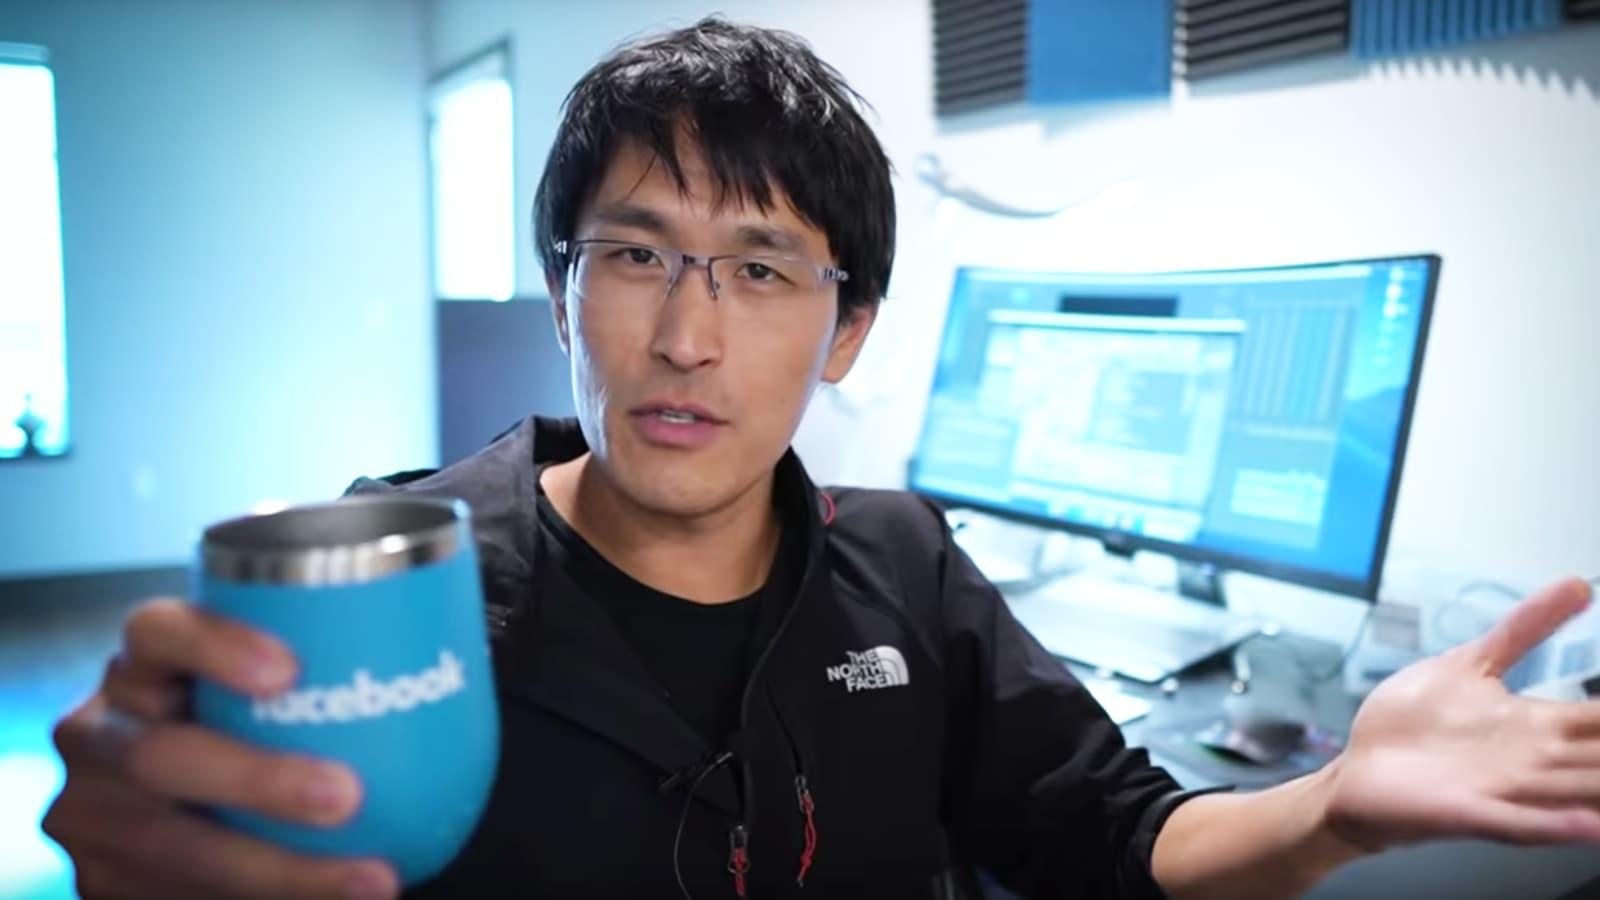 Ex-Facebook engineer Patrick Shyu makes fun of company on YouTube